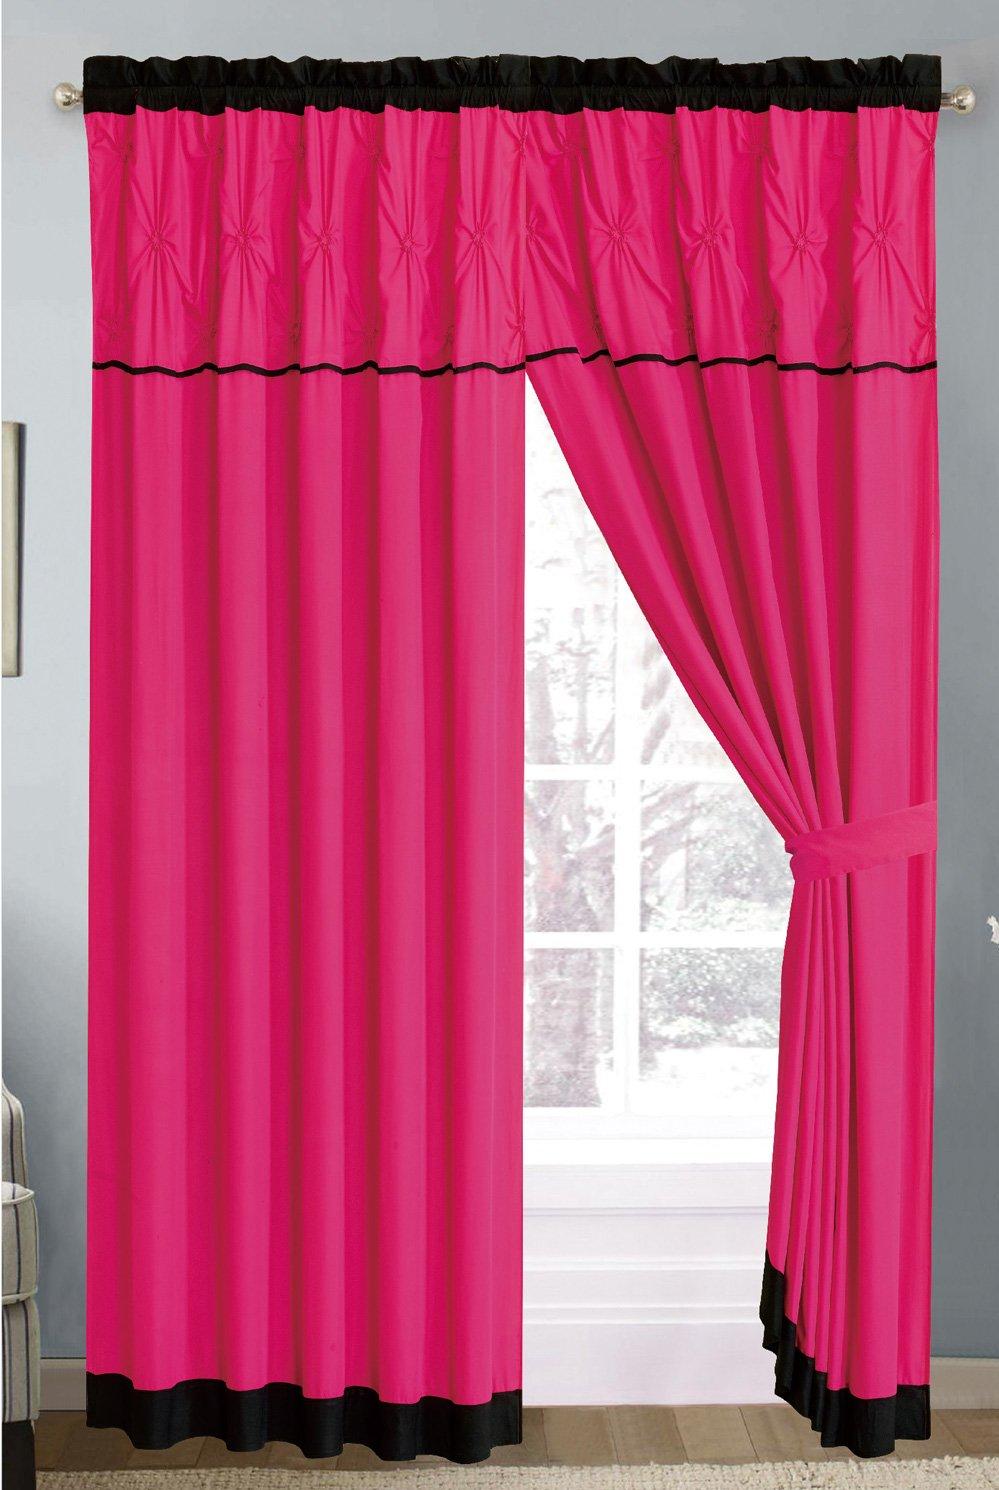 Modern Hot Pink / Black Geometric Embroidered Curtain set